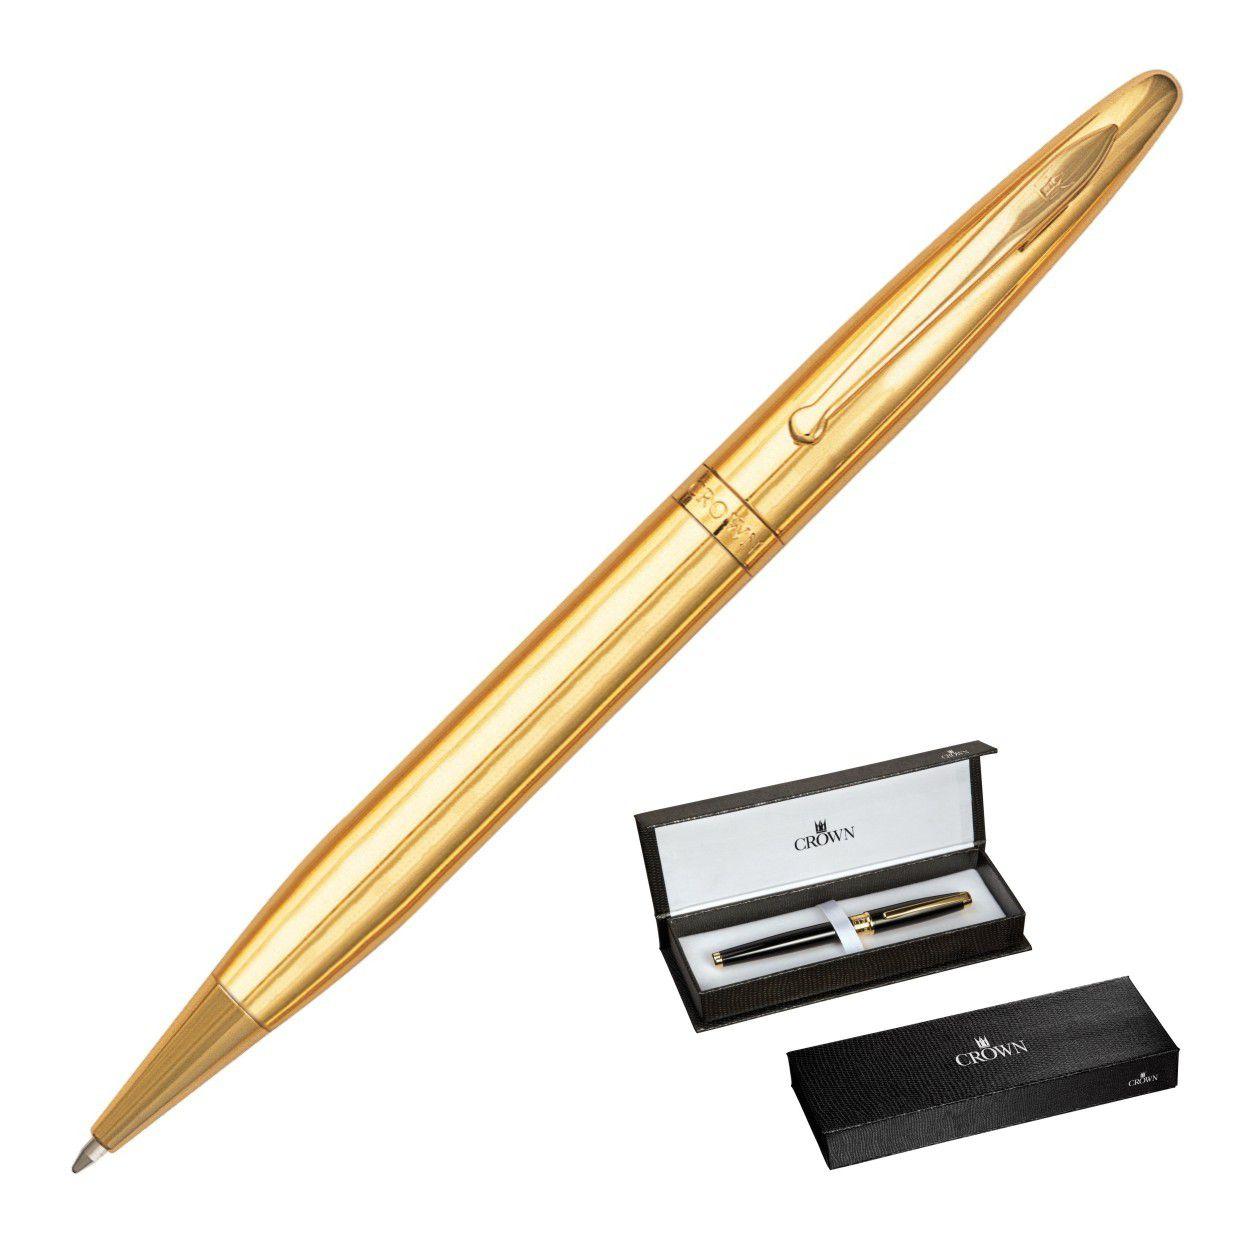 Crown Elegance Esferográfica Dourada